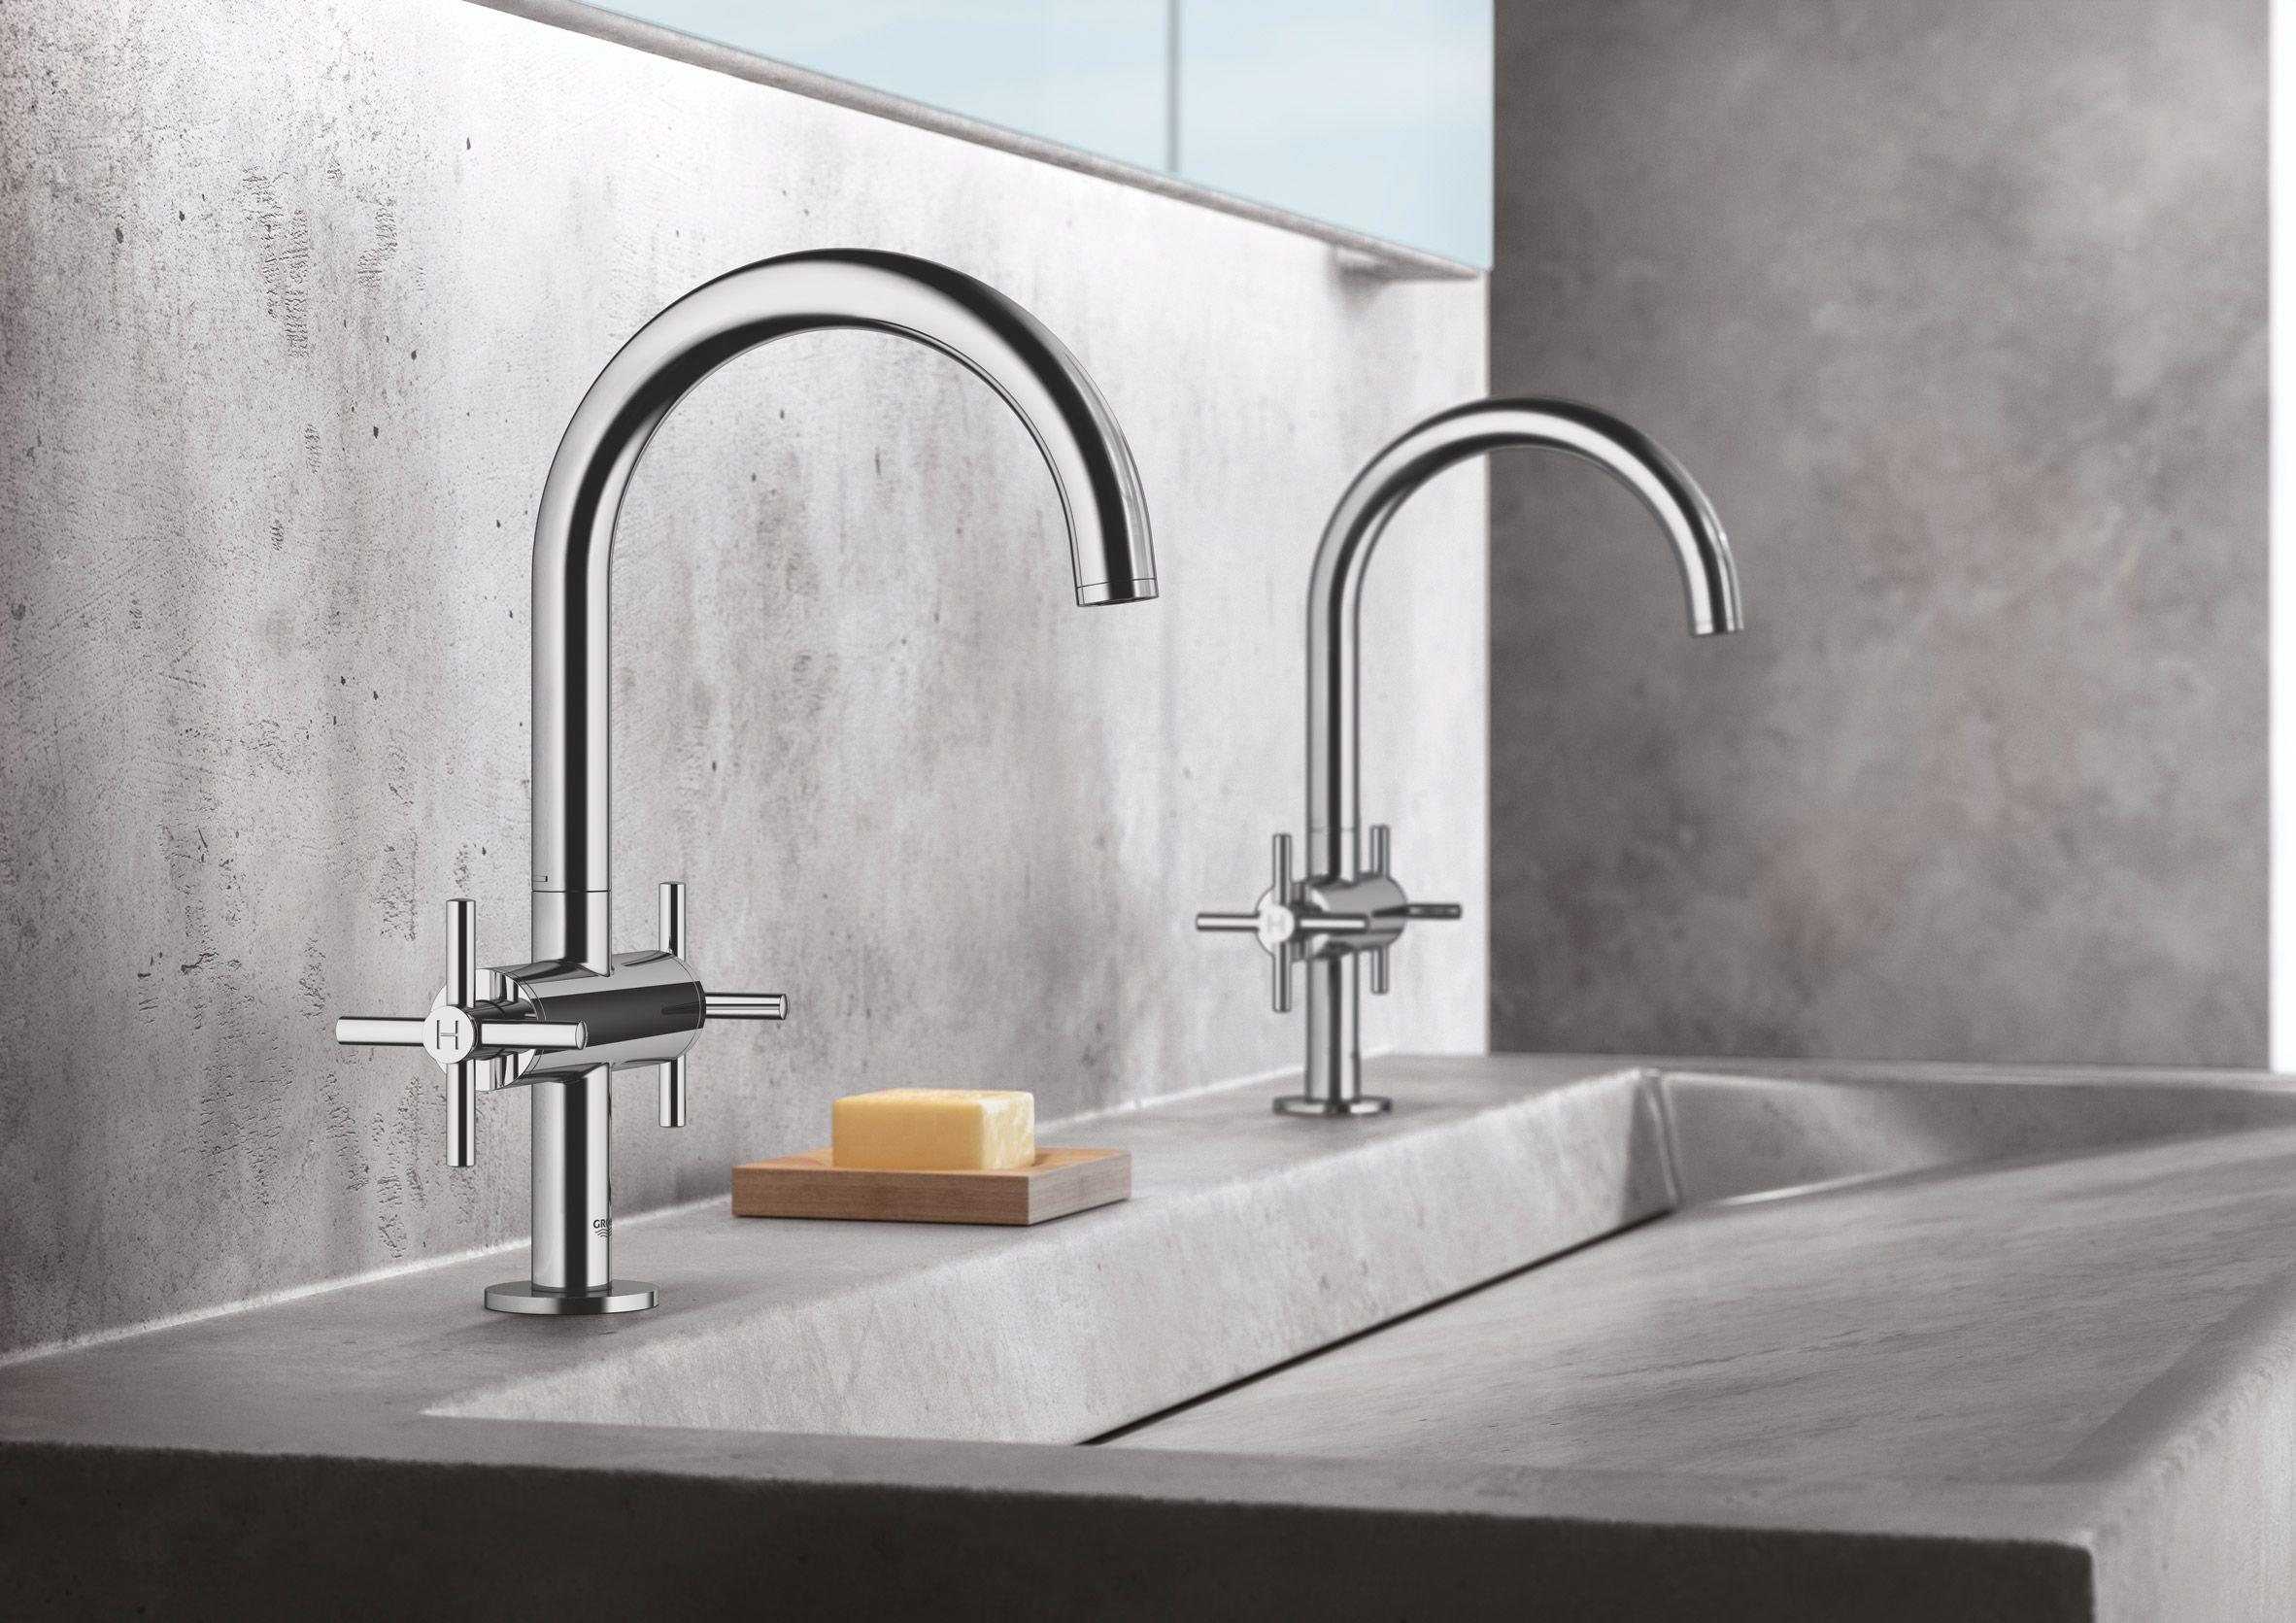 atrio bathroom tap faucet